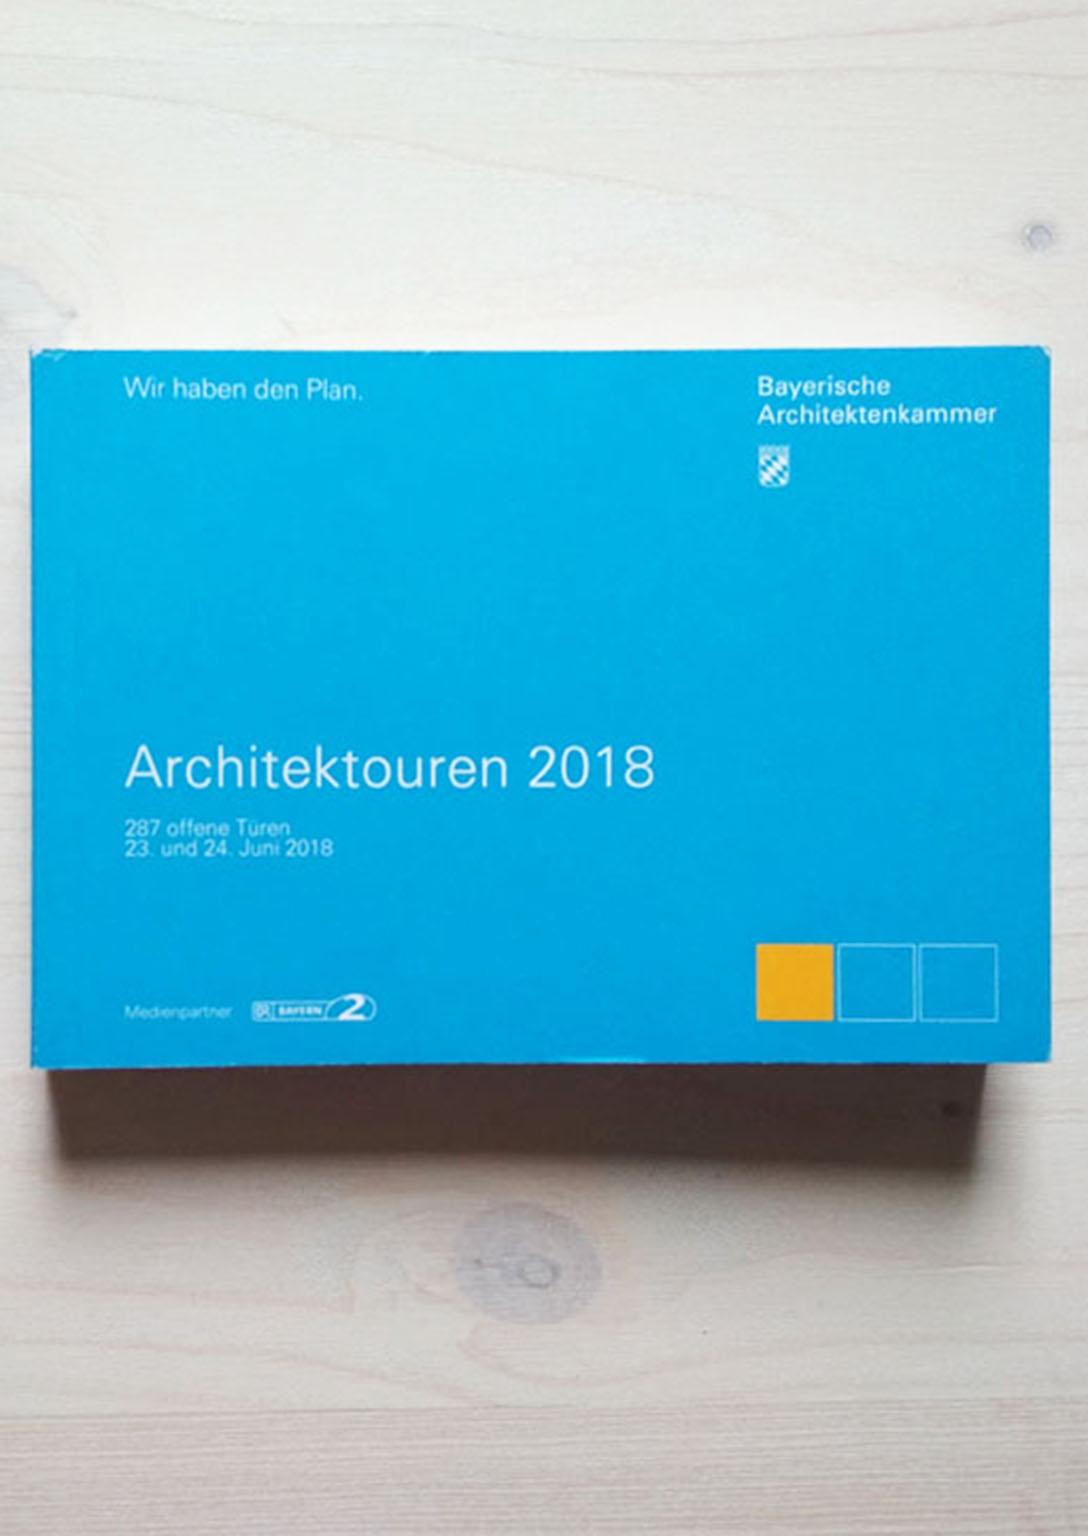 Architektouren 2018